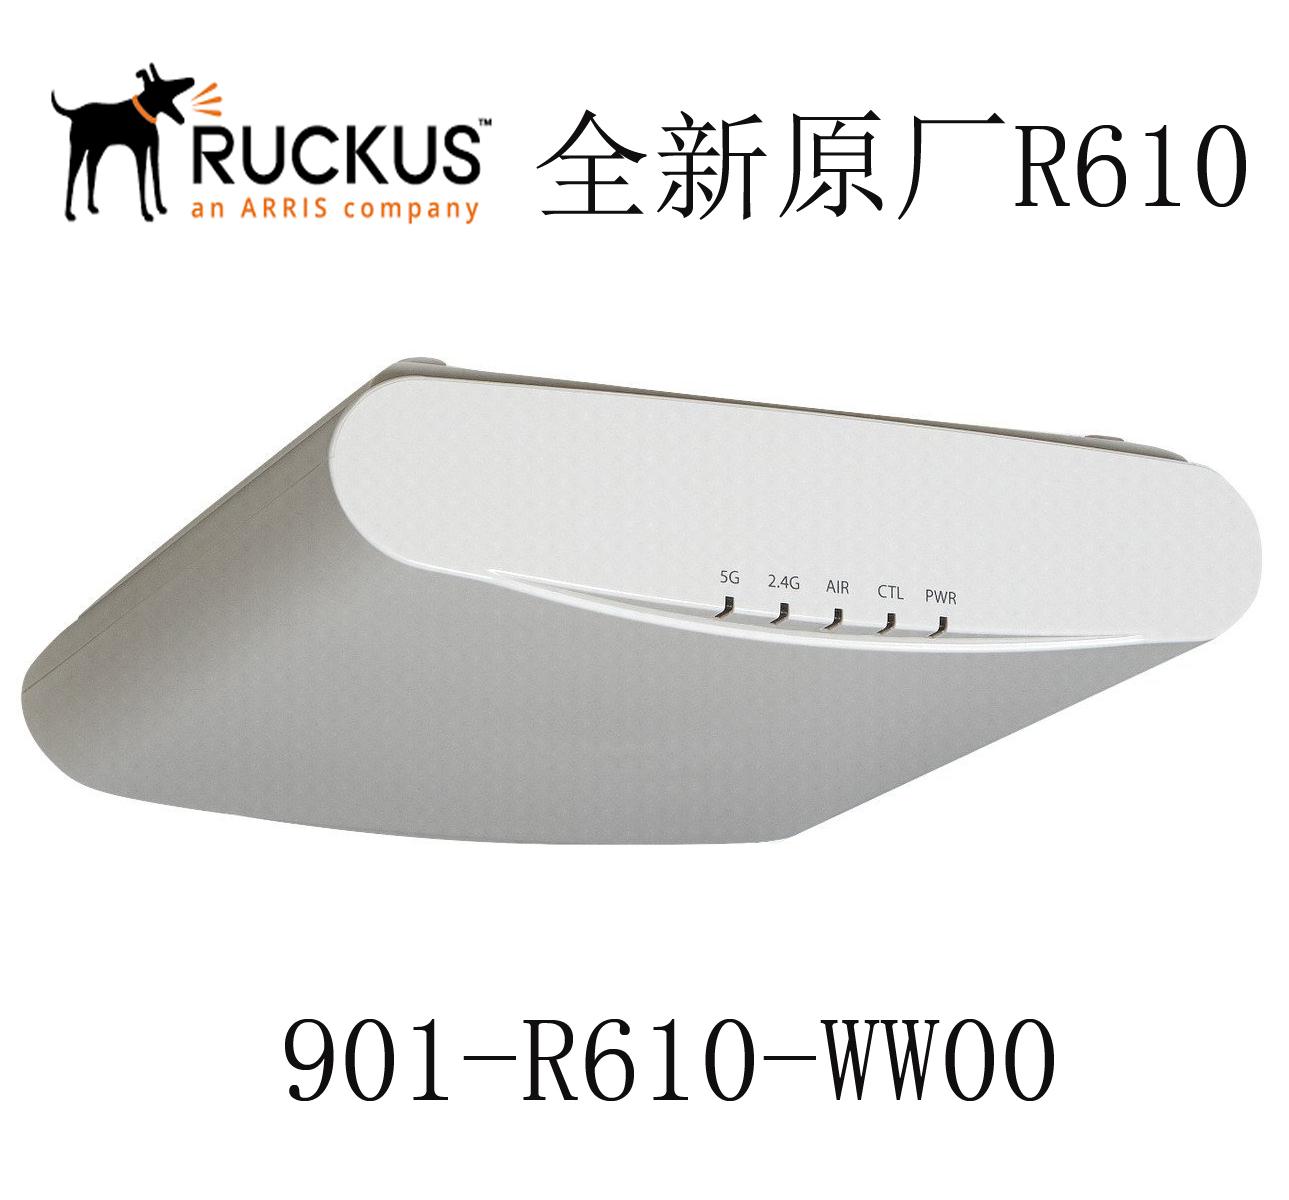 Ruckus R610 901-R610-WW00 United States zoneflexr610